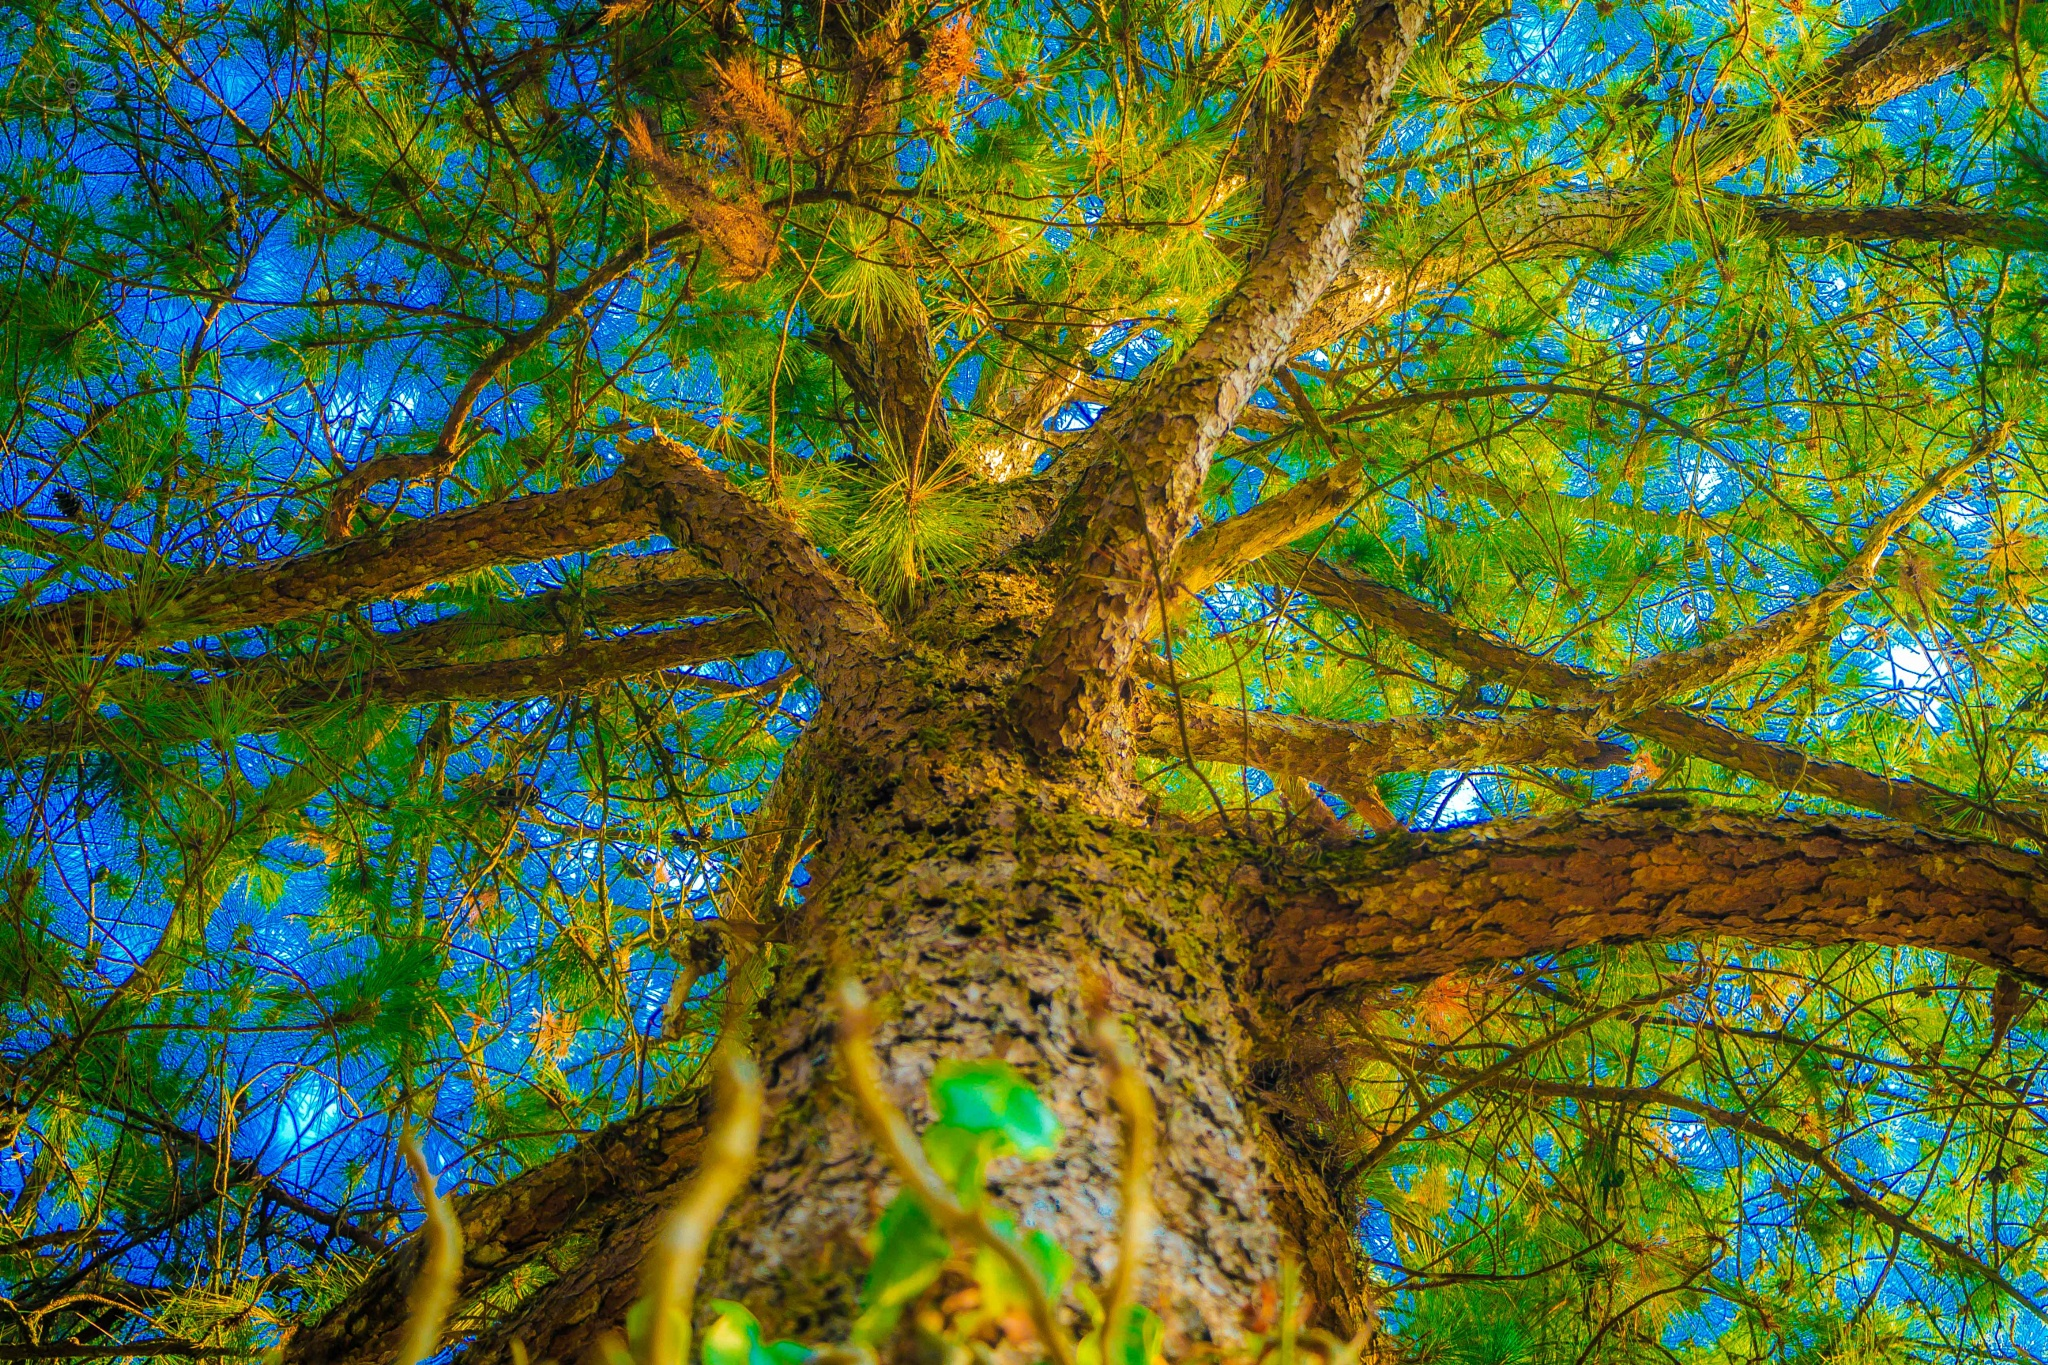 Blue & Green by lynardsnaps